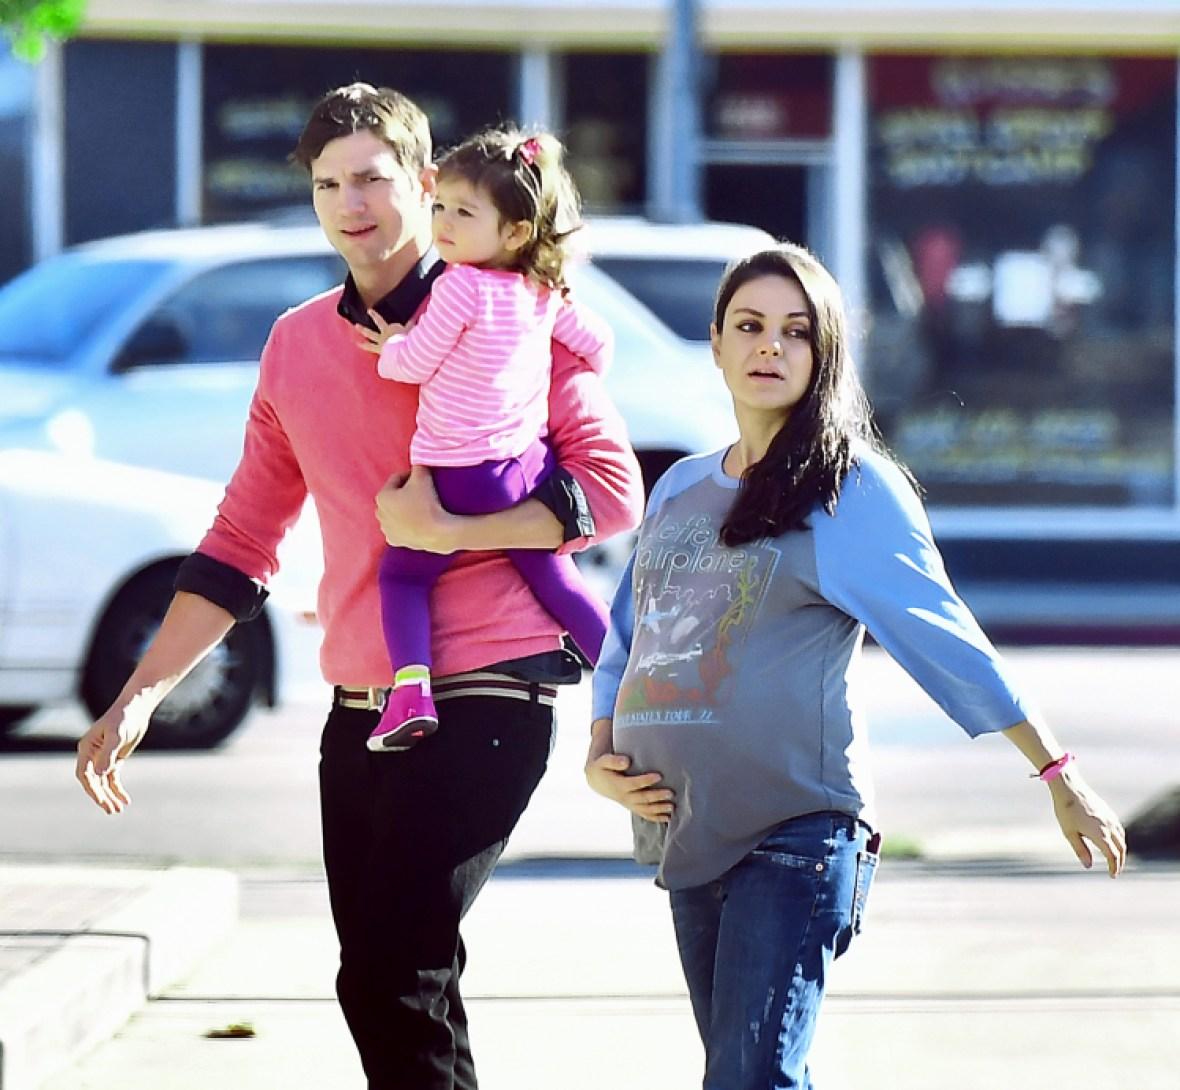 Mila Kunis Recalls Her Scary Honeymoon With Husband Ashton Kutcher